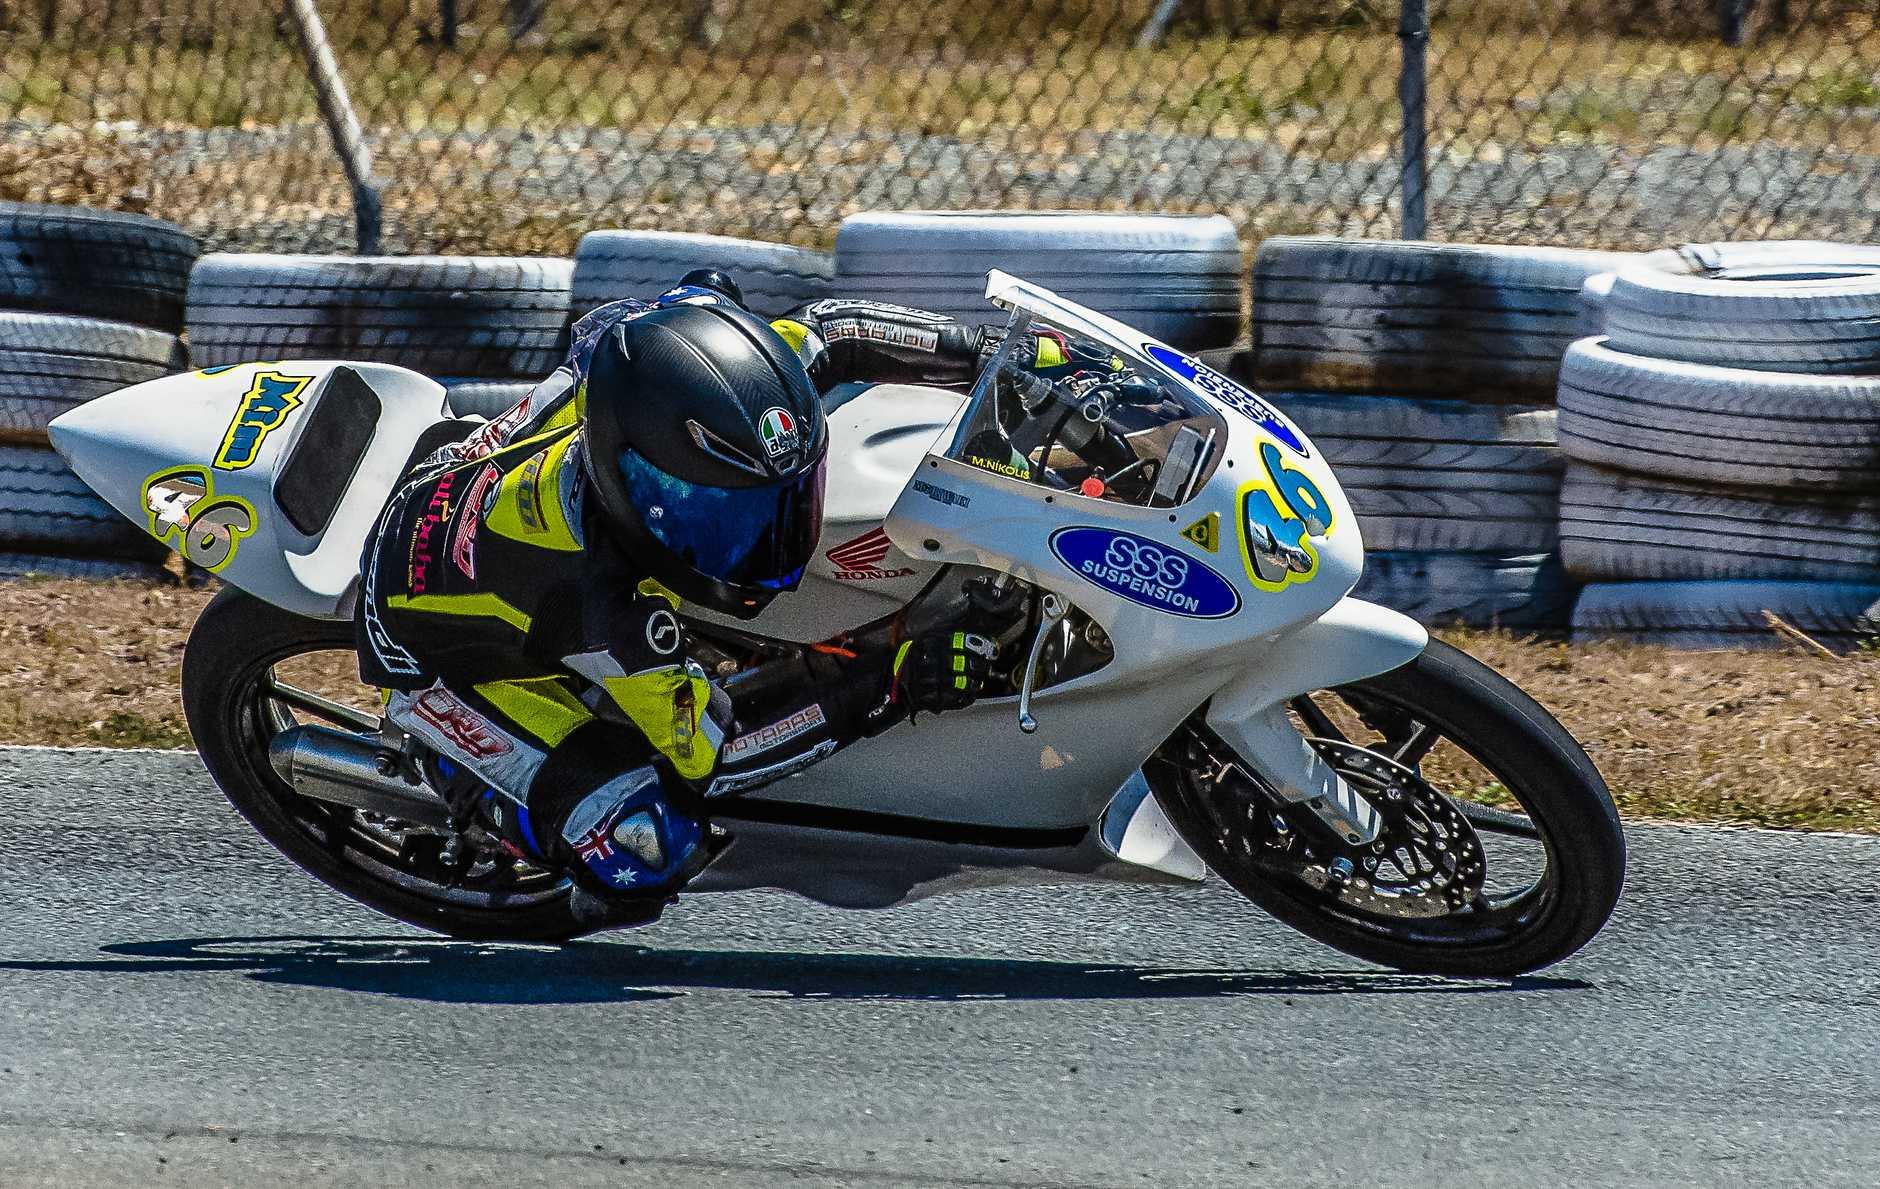 Marianos Nikolis 1st Place 85cc / 2 stroke Champion 2019